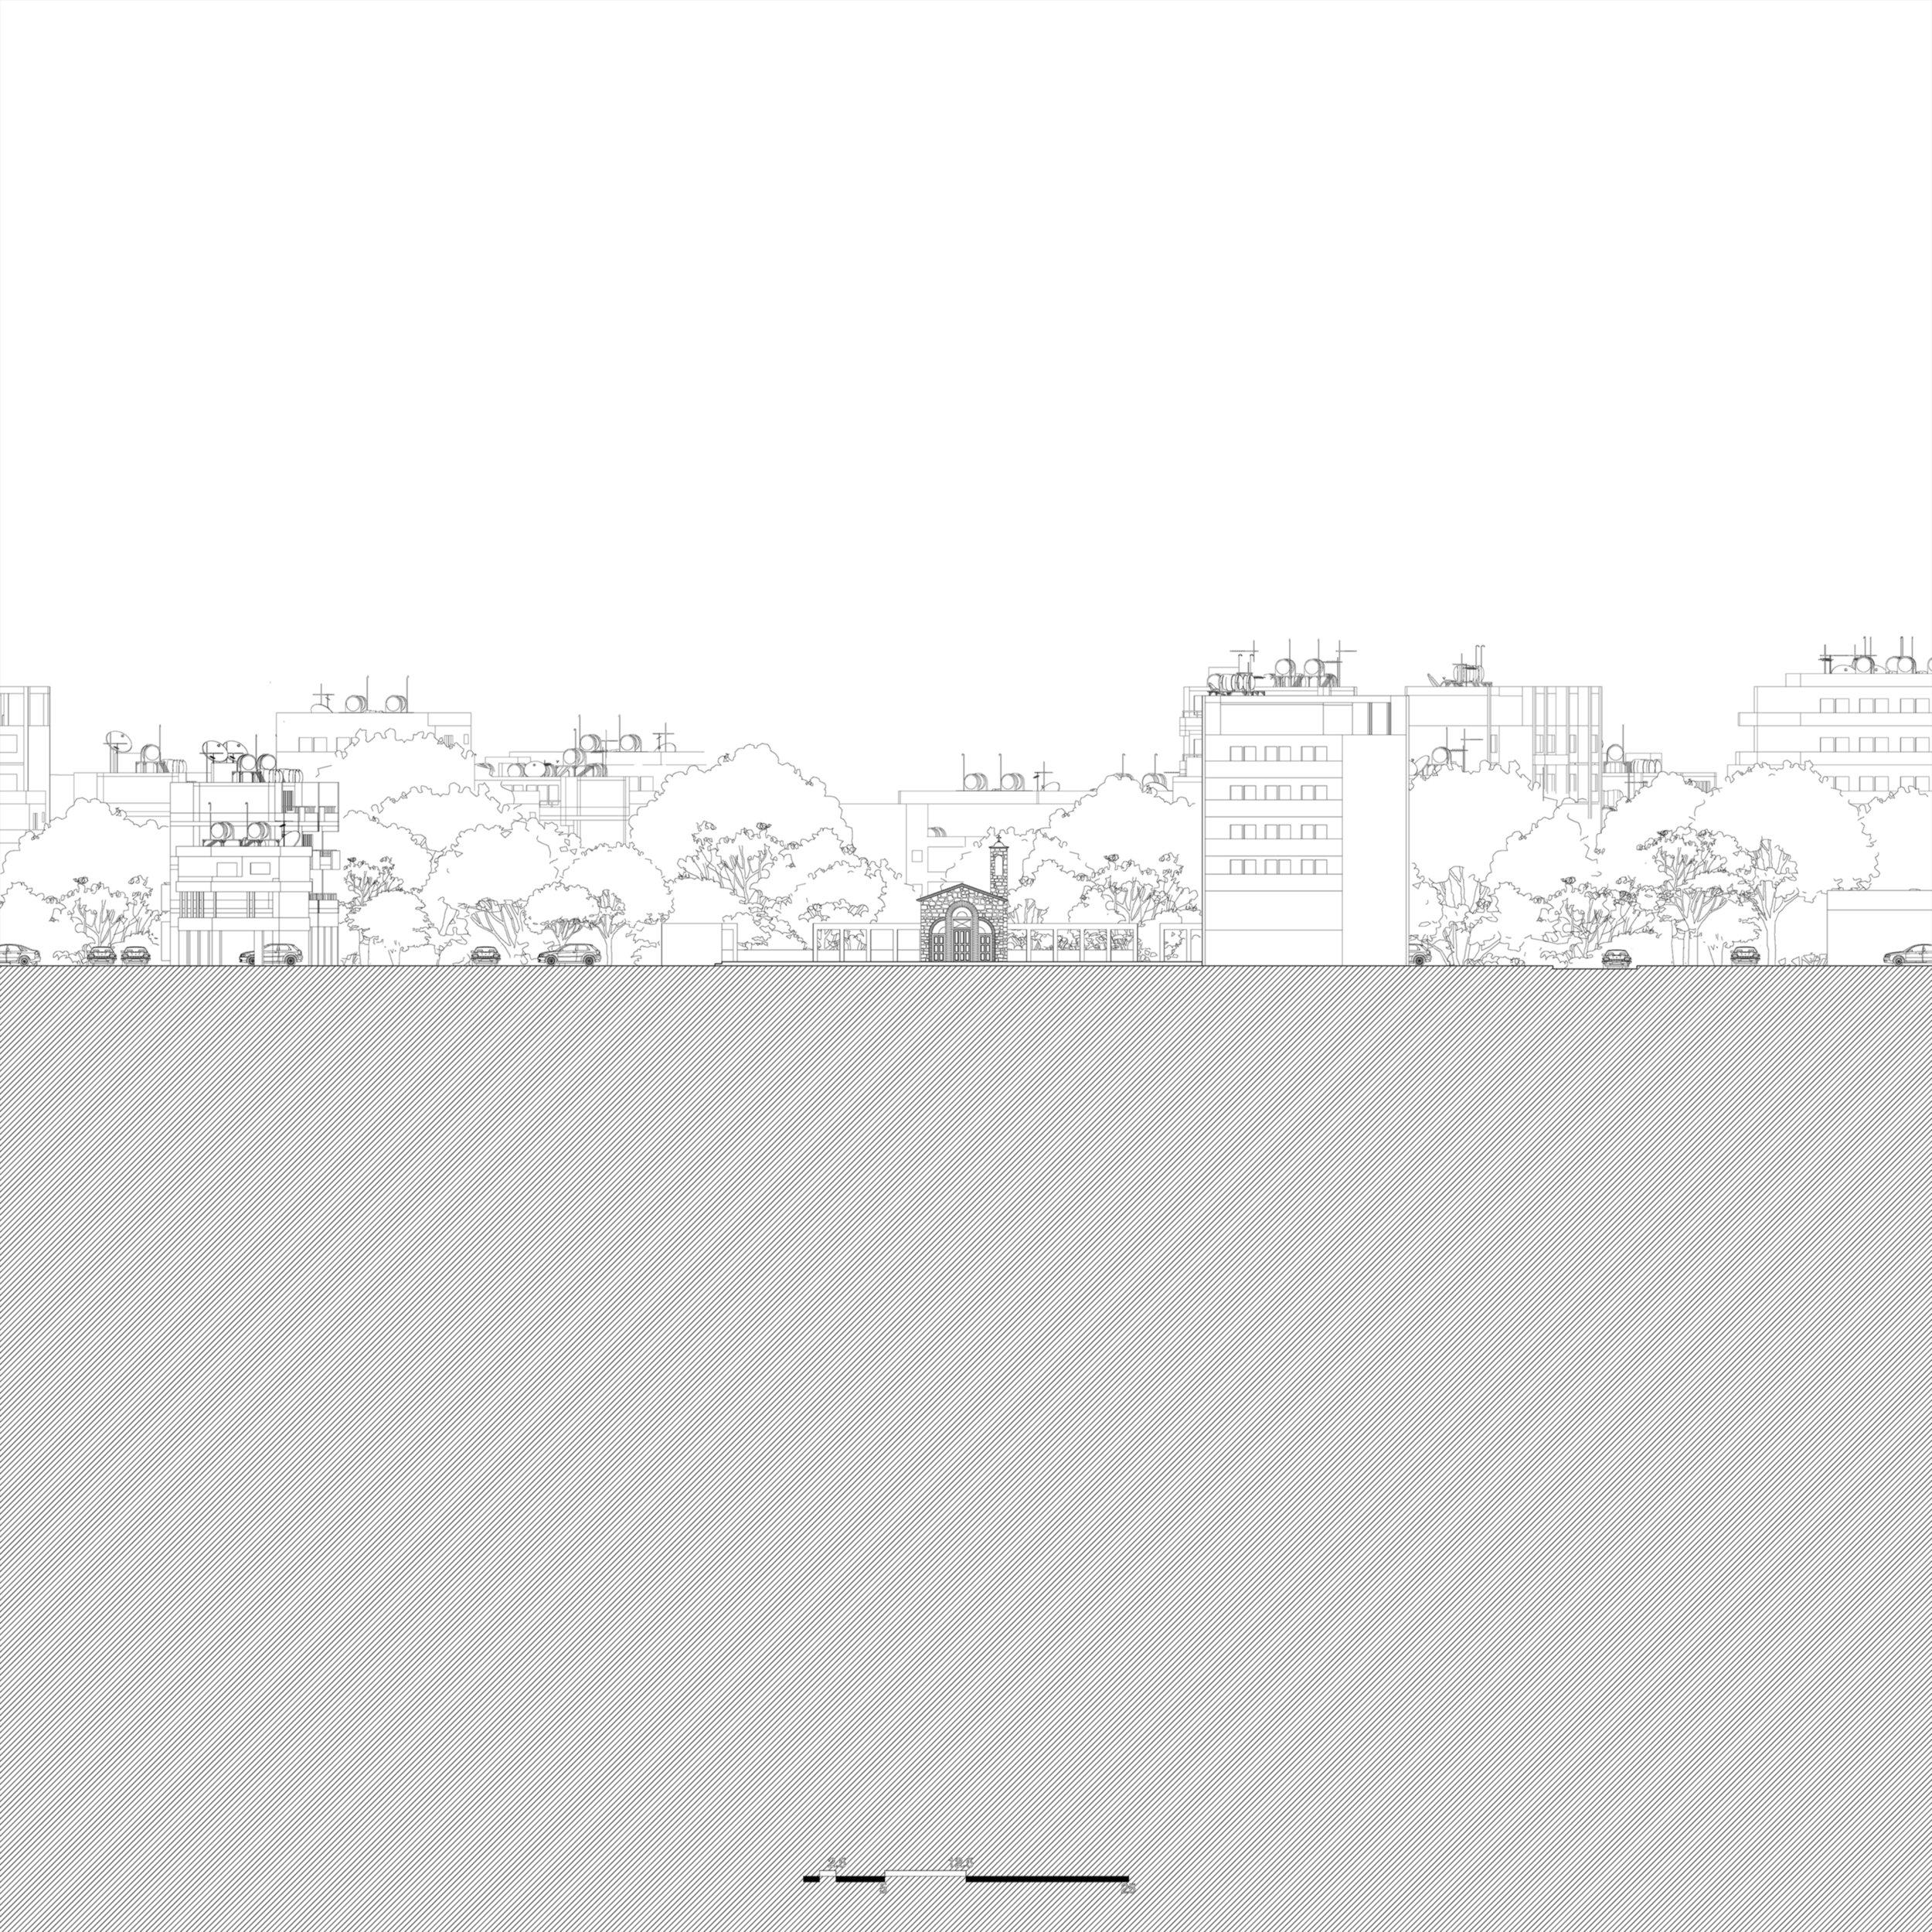 agia-marina-section.jpg